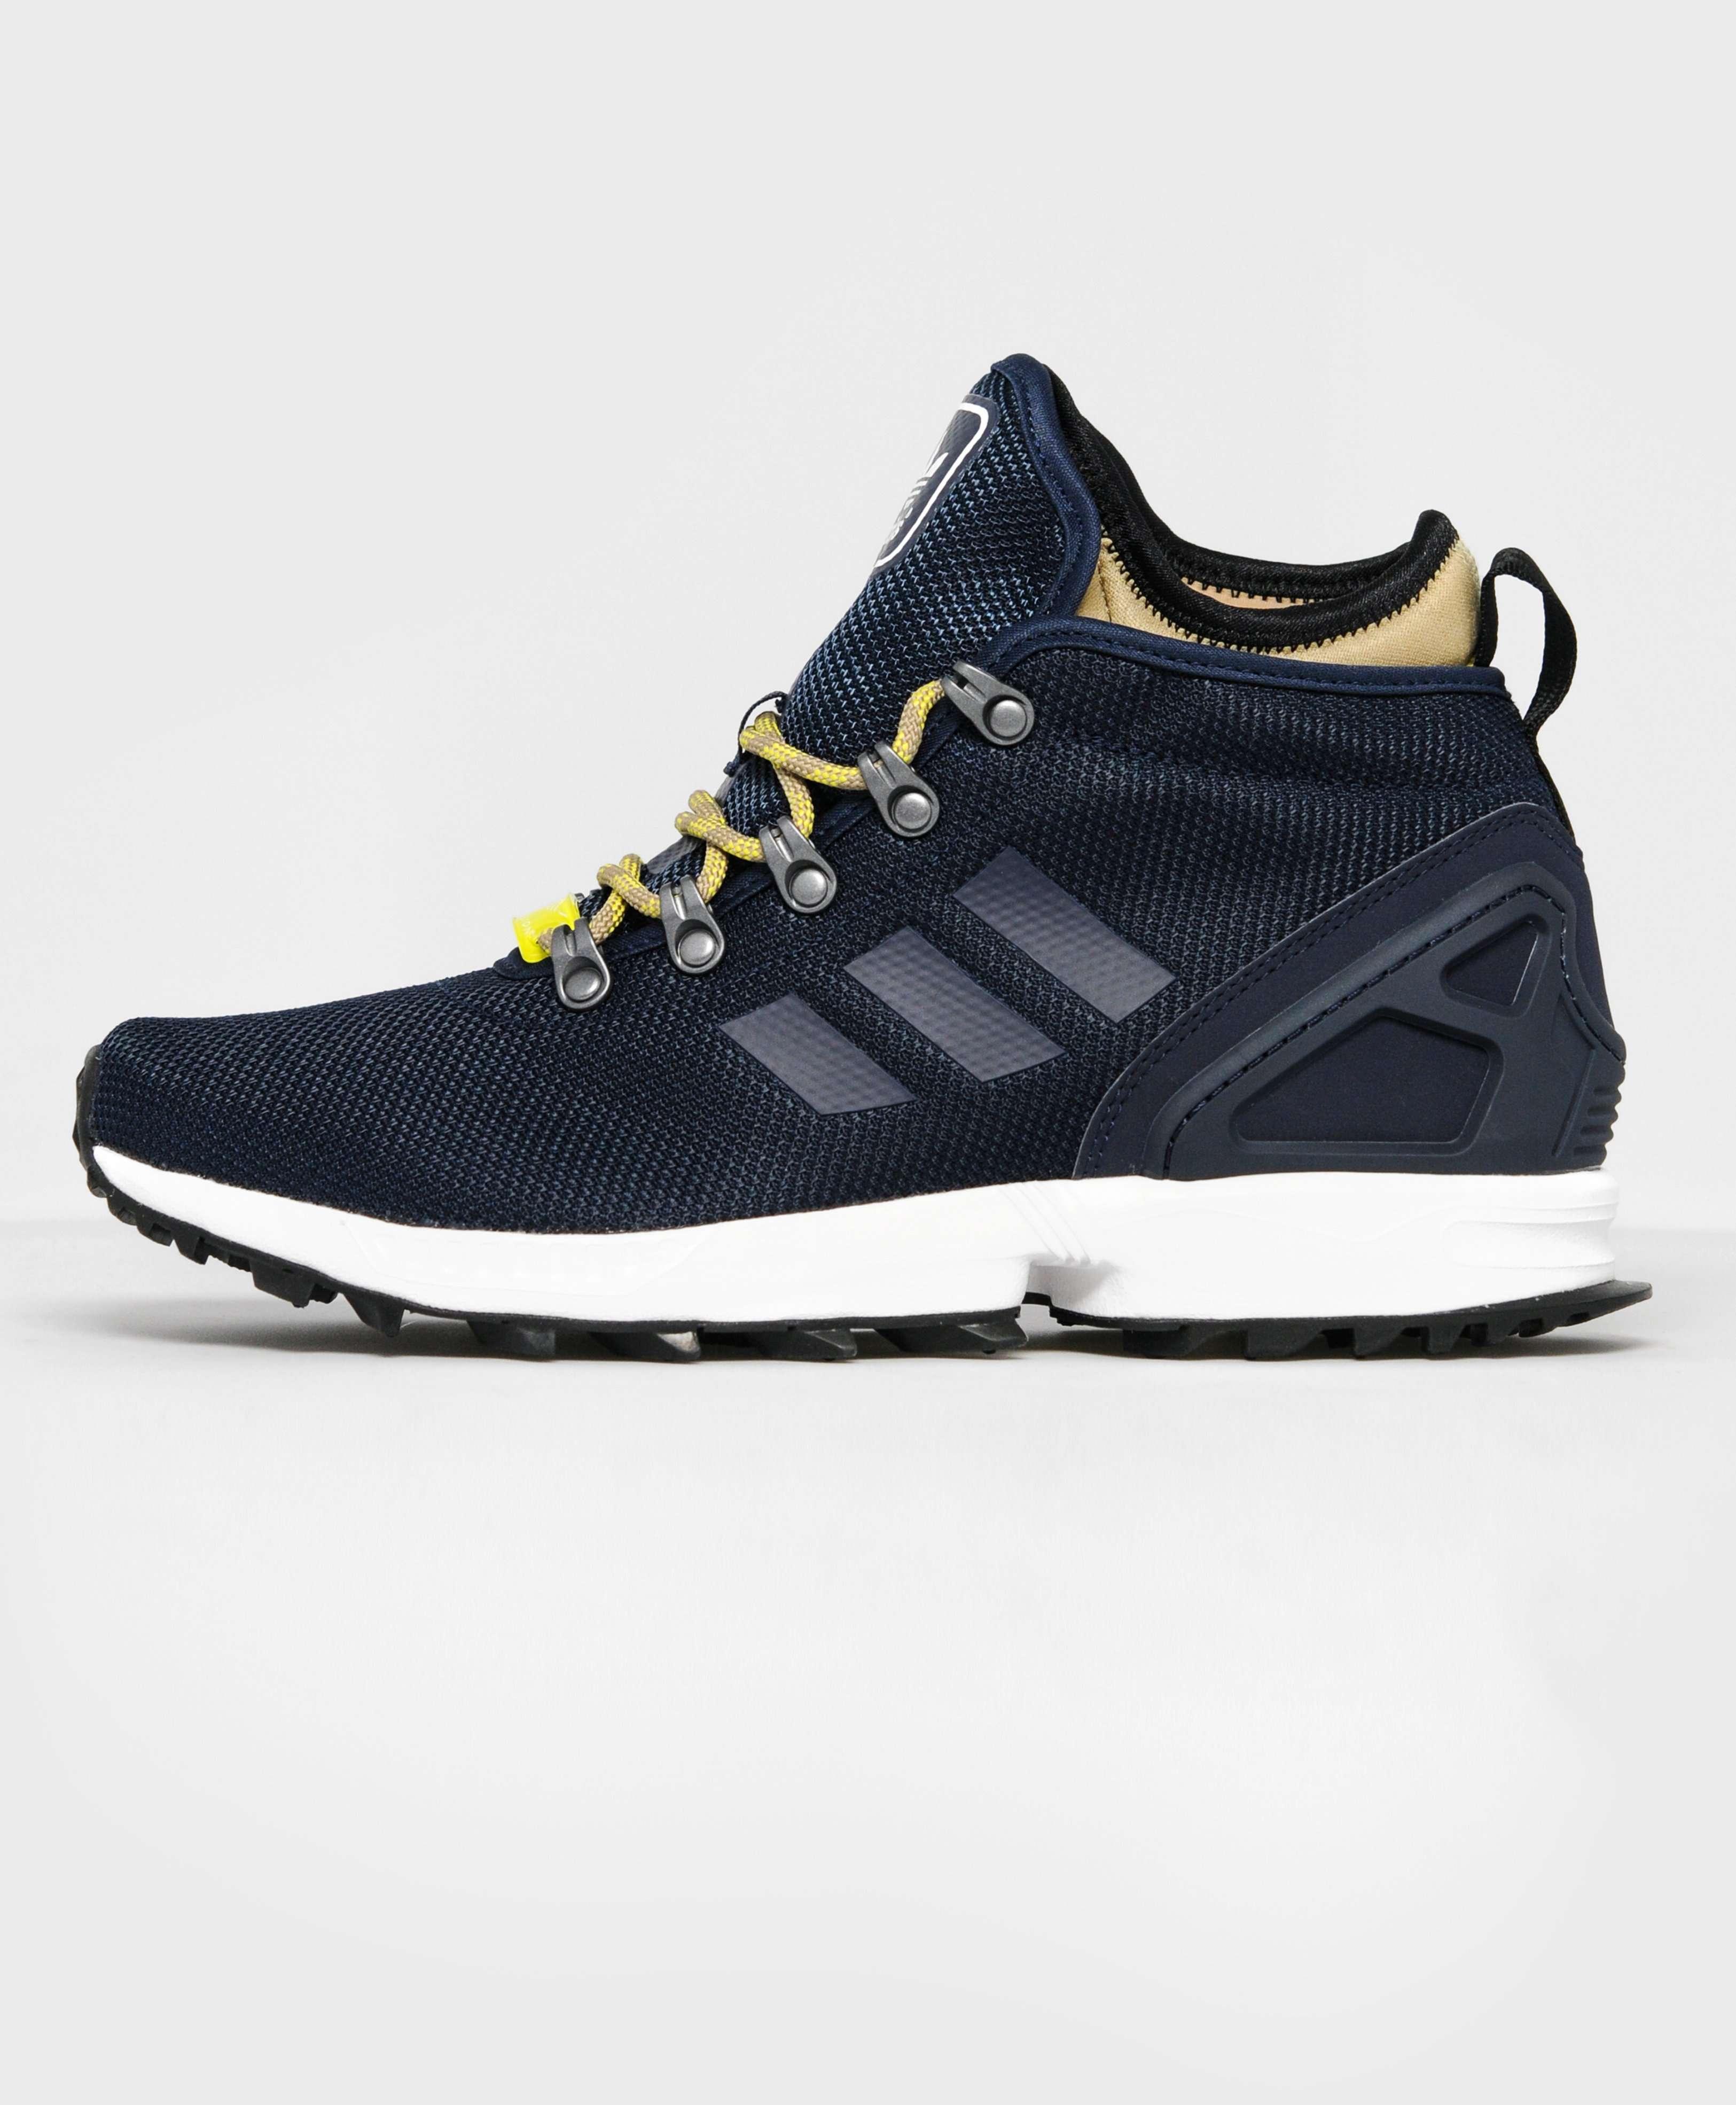 zx flux adidas boots